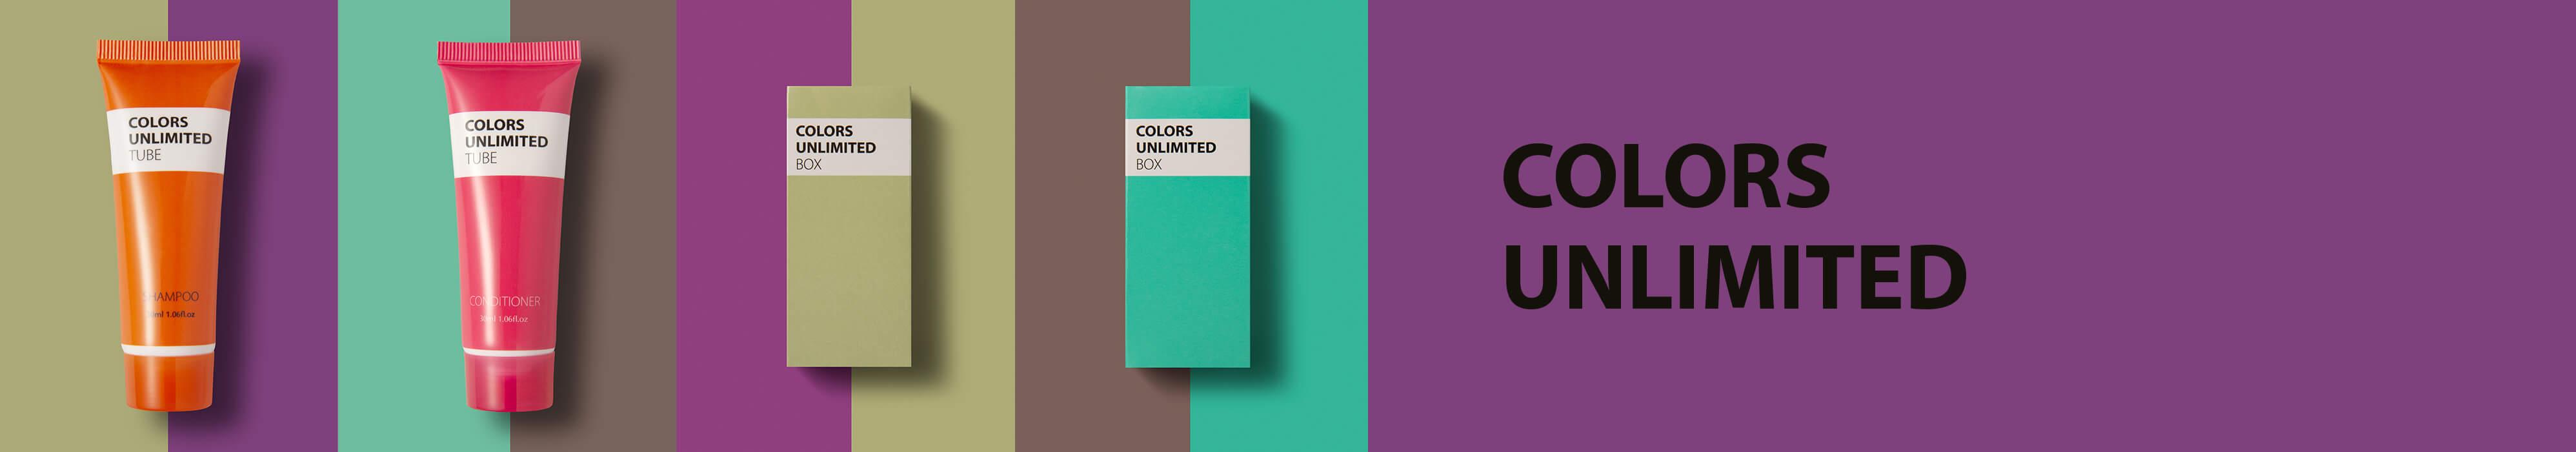 Colors Unlimited